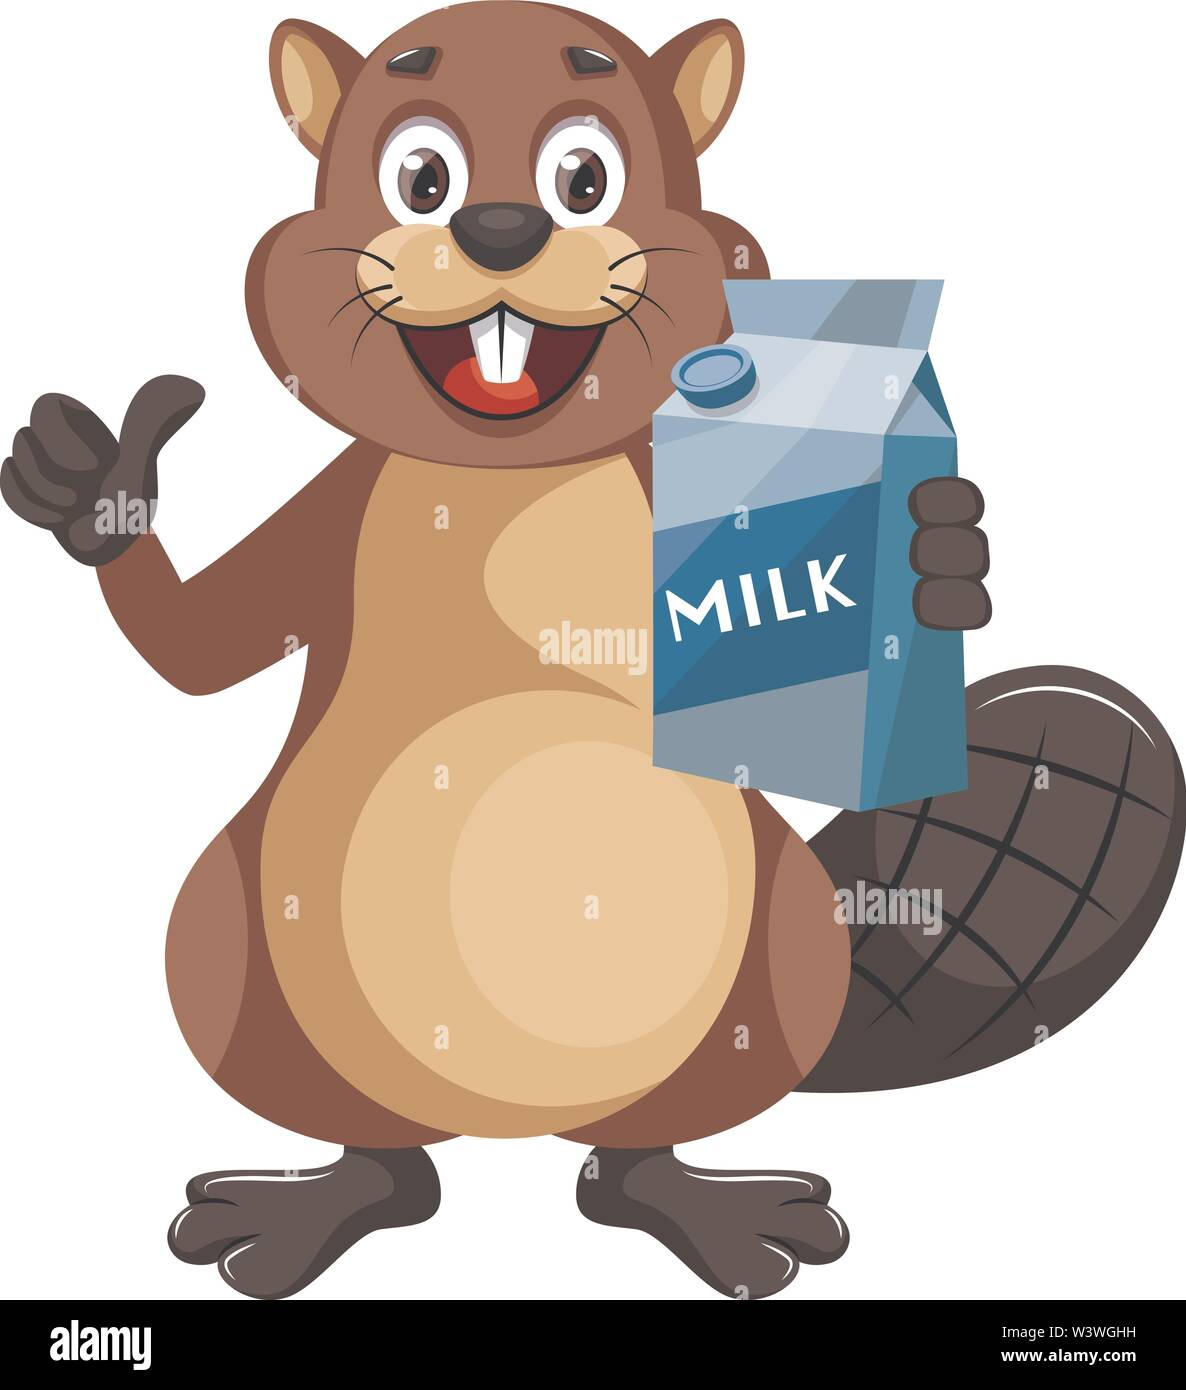 Beaver with milk, illustration, vector on white background. - Stock Image